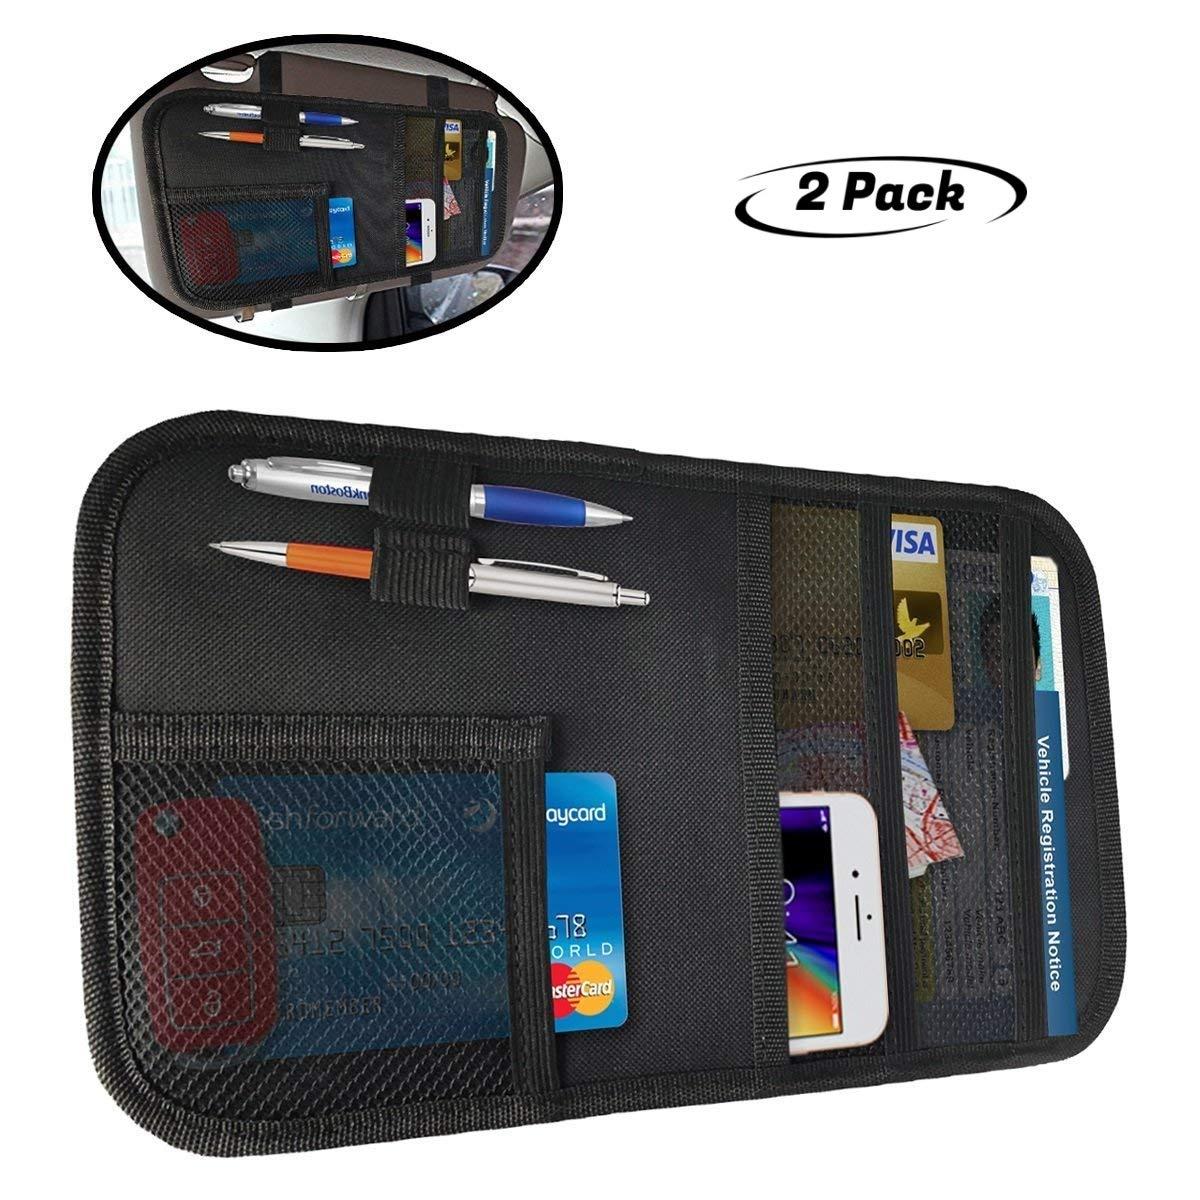 lebogner Car Sun Visor Organizer, 2 Pack Auto Interior Accessories Pocket Organizer, Registration and Document Holder, Personal Belonging Storage Pouch Organizer by lebogner